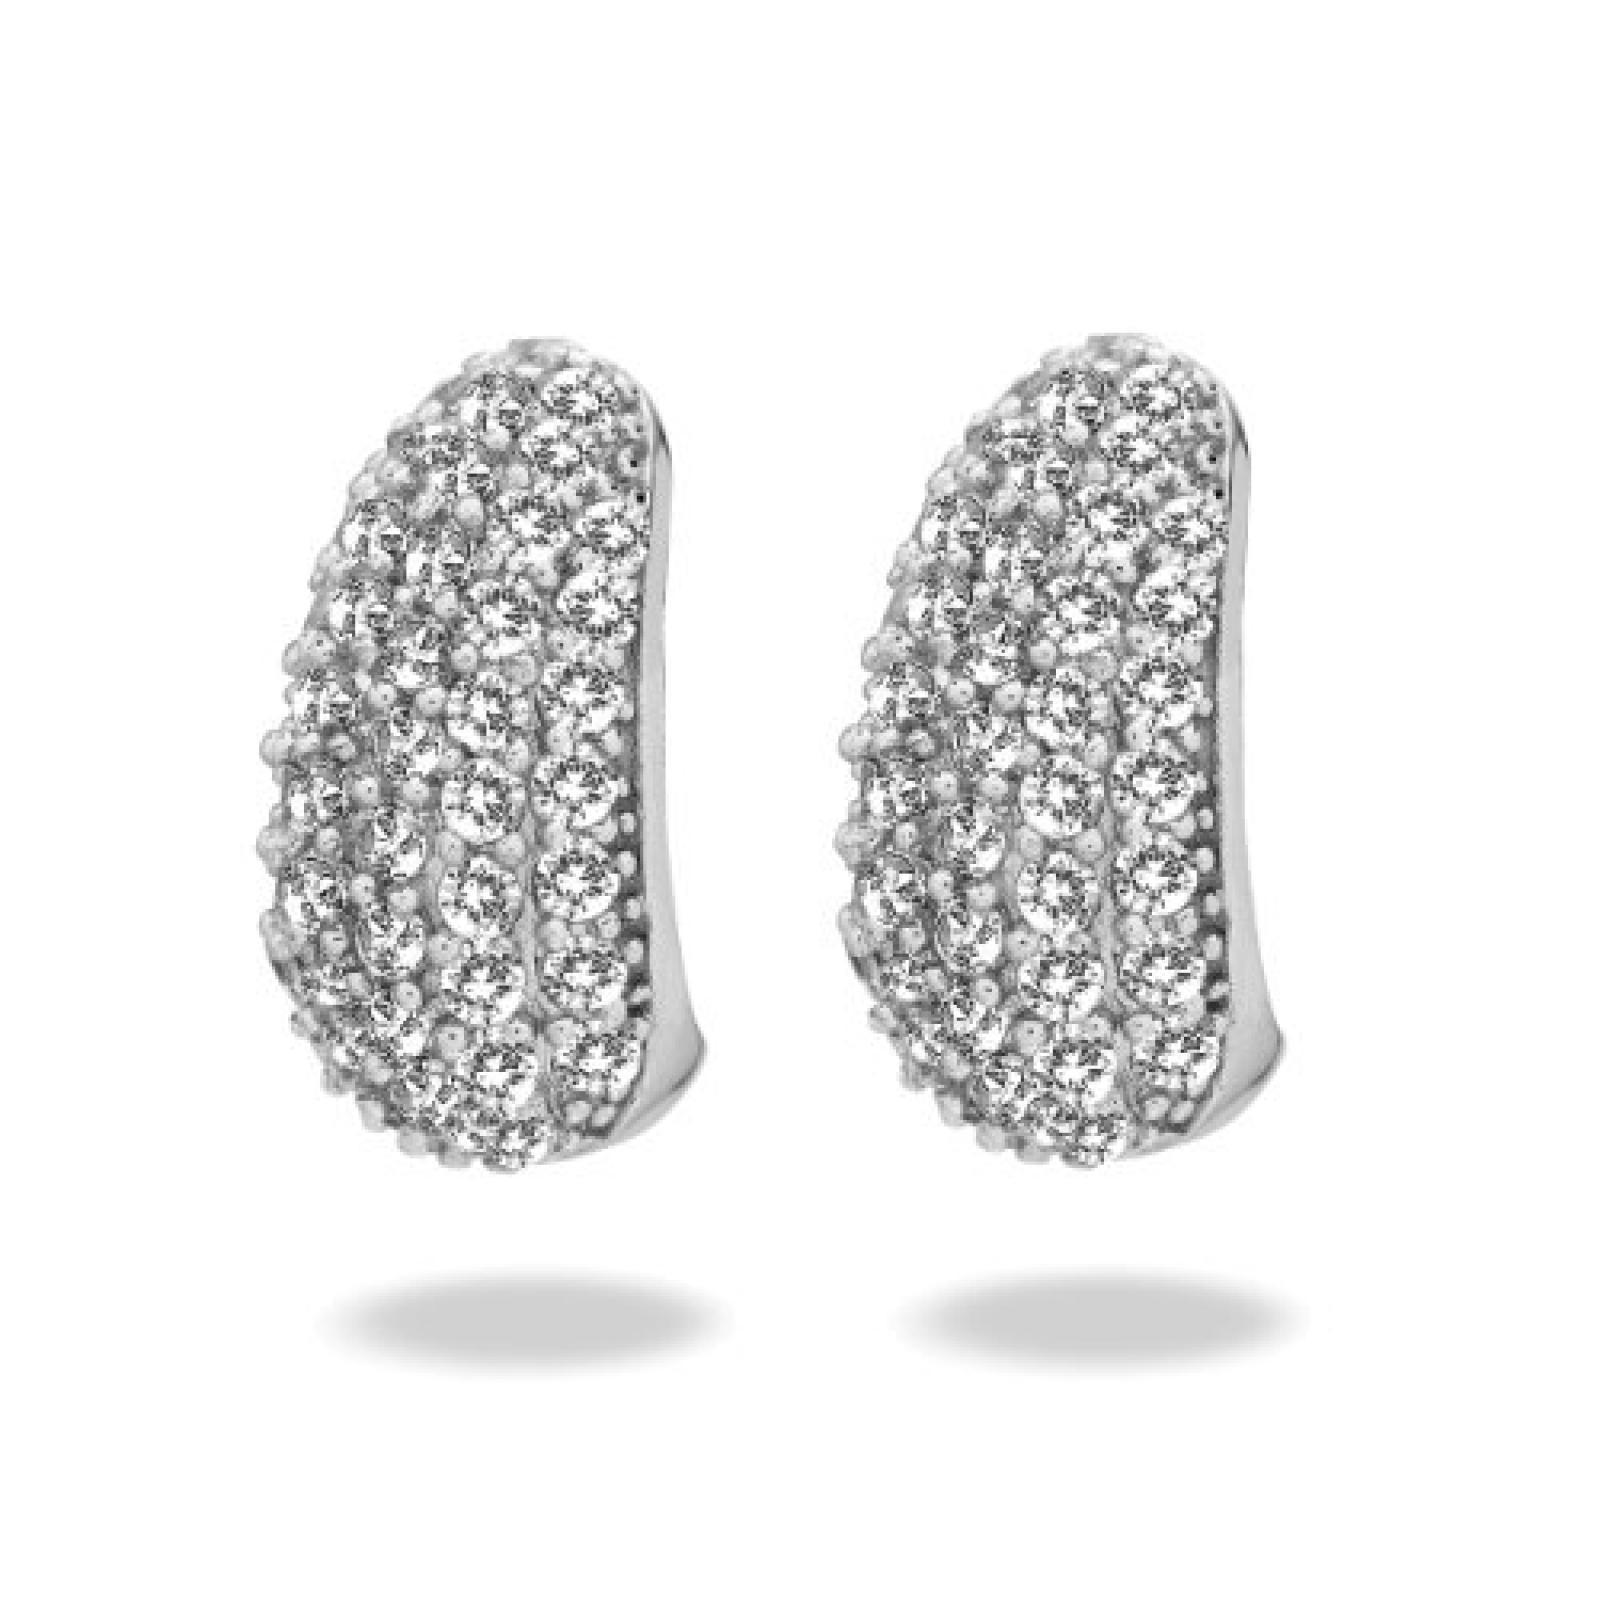 Rafaela Donata Damen-Creolen Classic Collection Zirkonia weiß 925 Sterling Silber 60837034